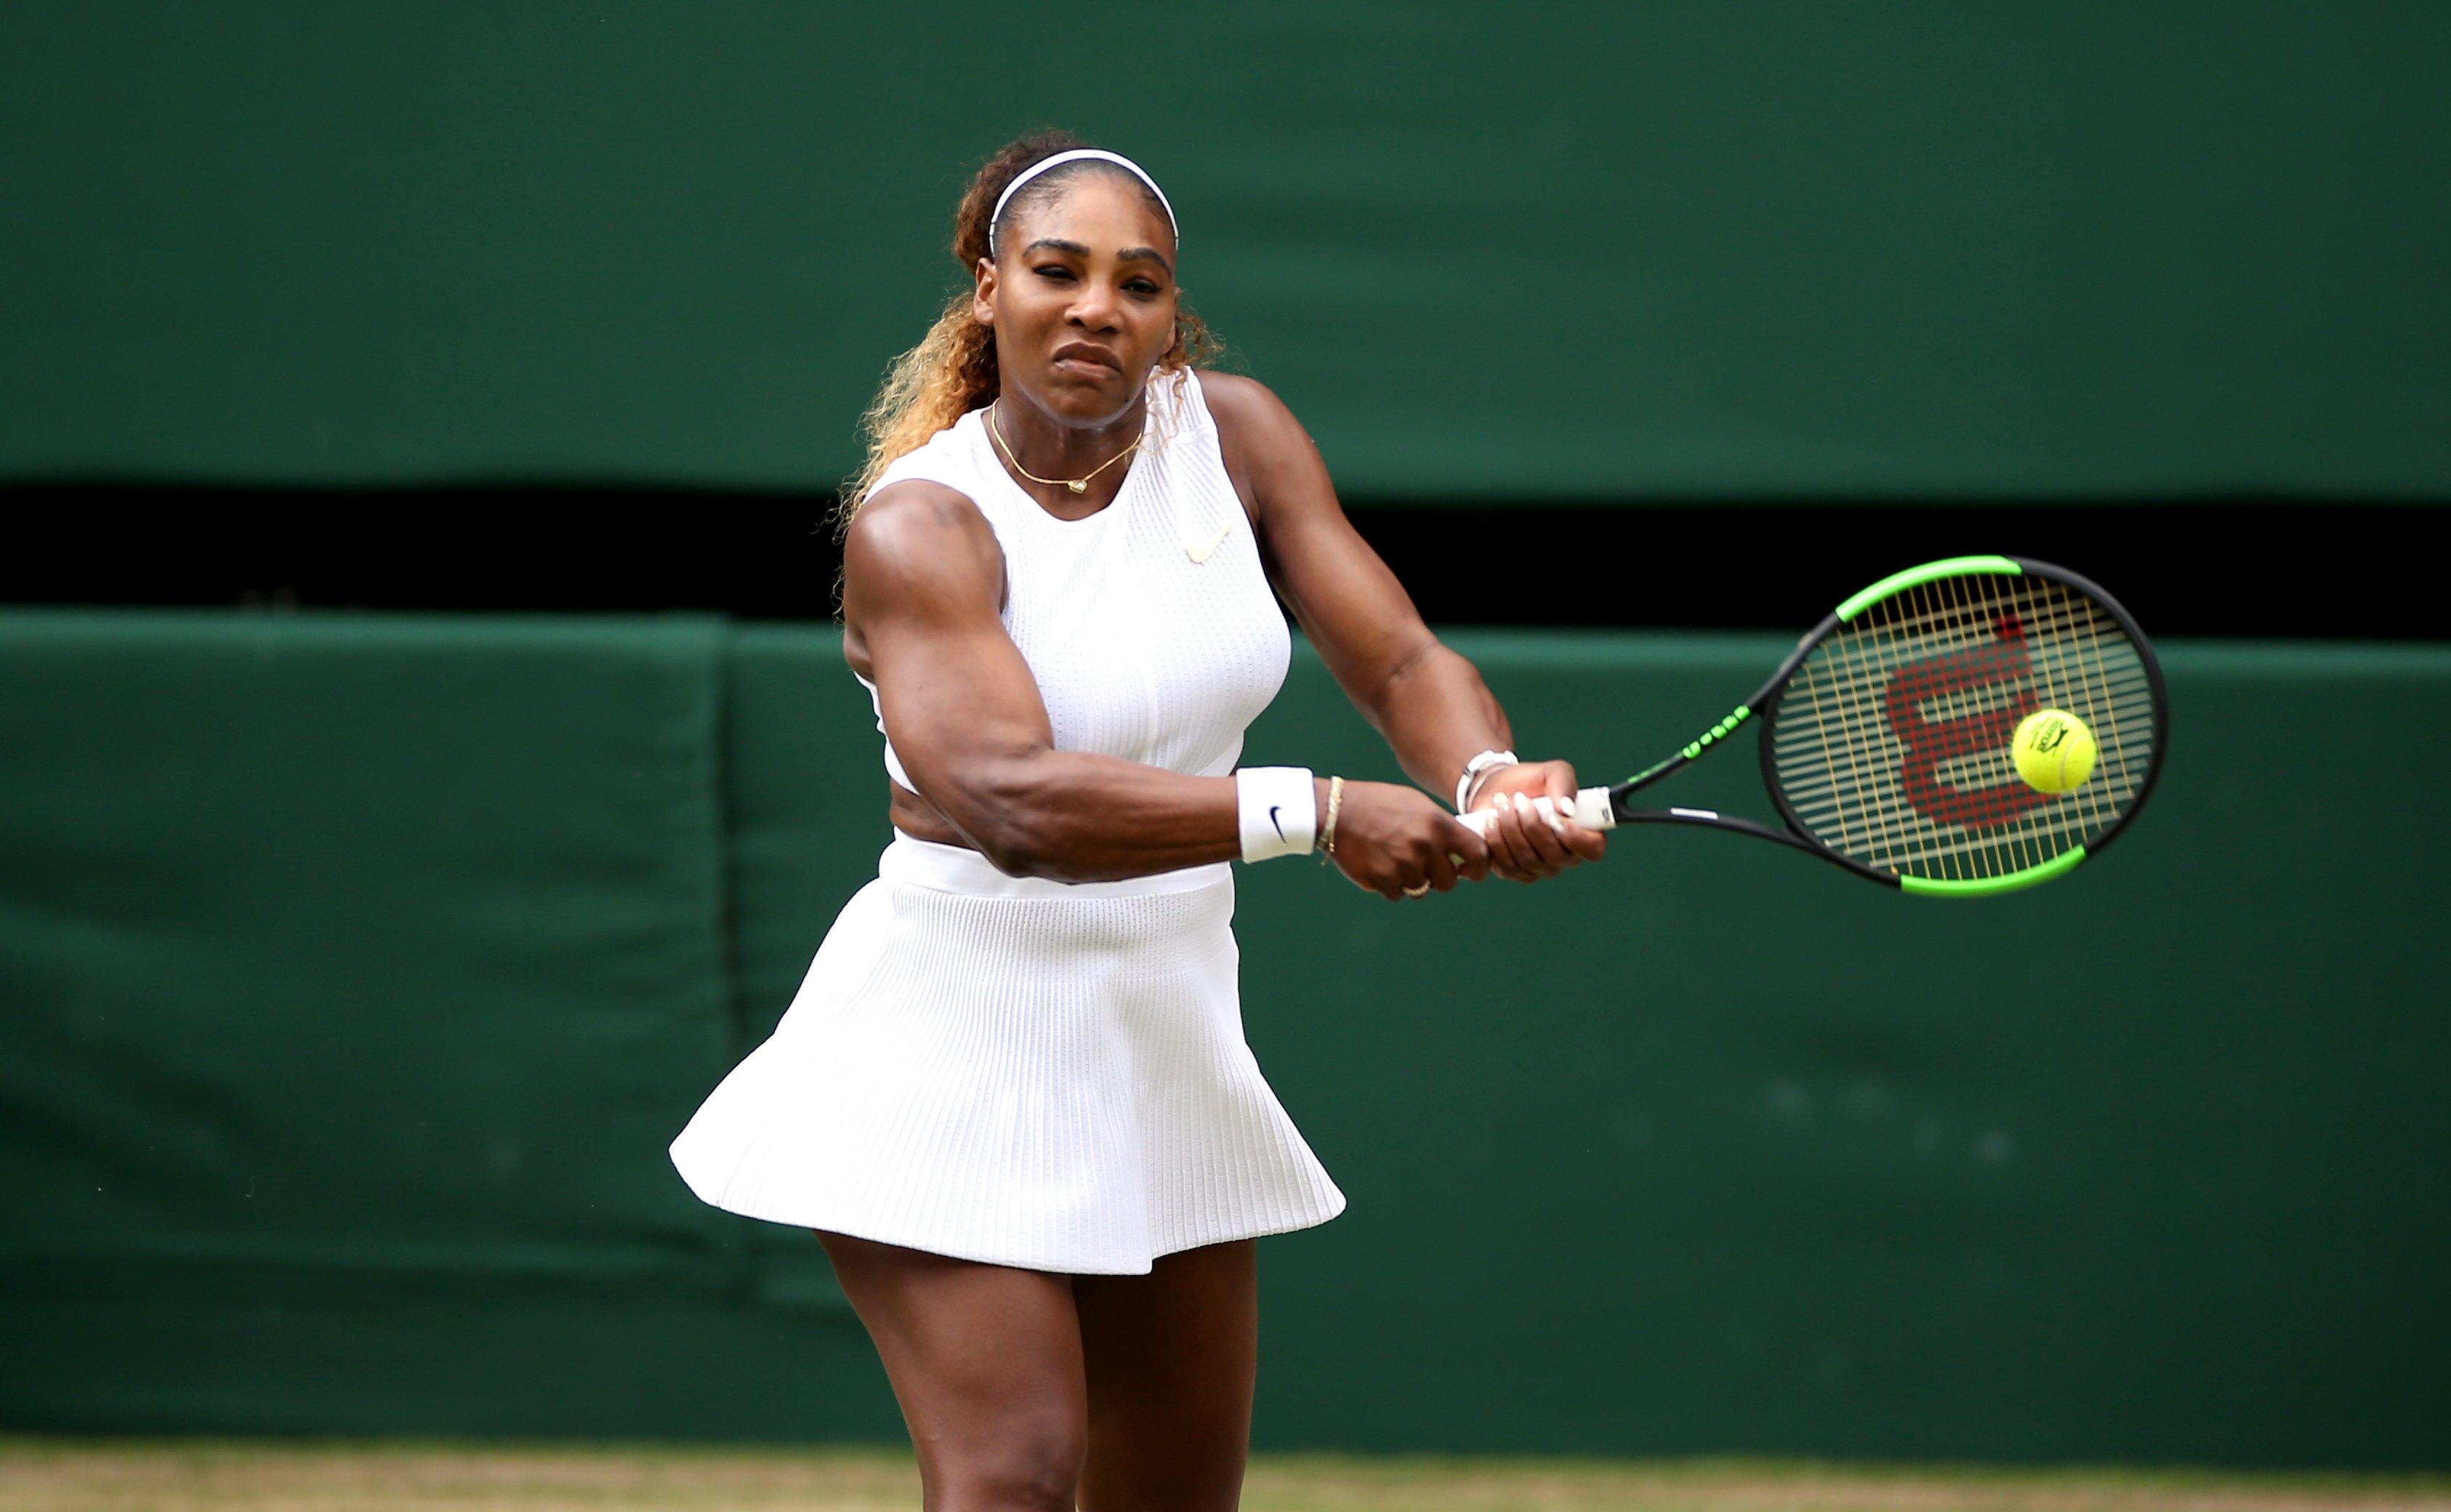 Serena Williams relishing 'tough match' against sister Venus in Lexington